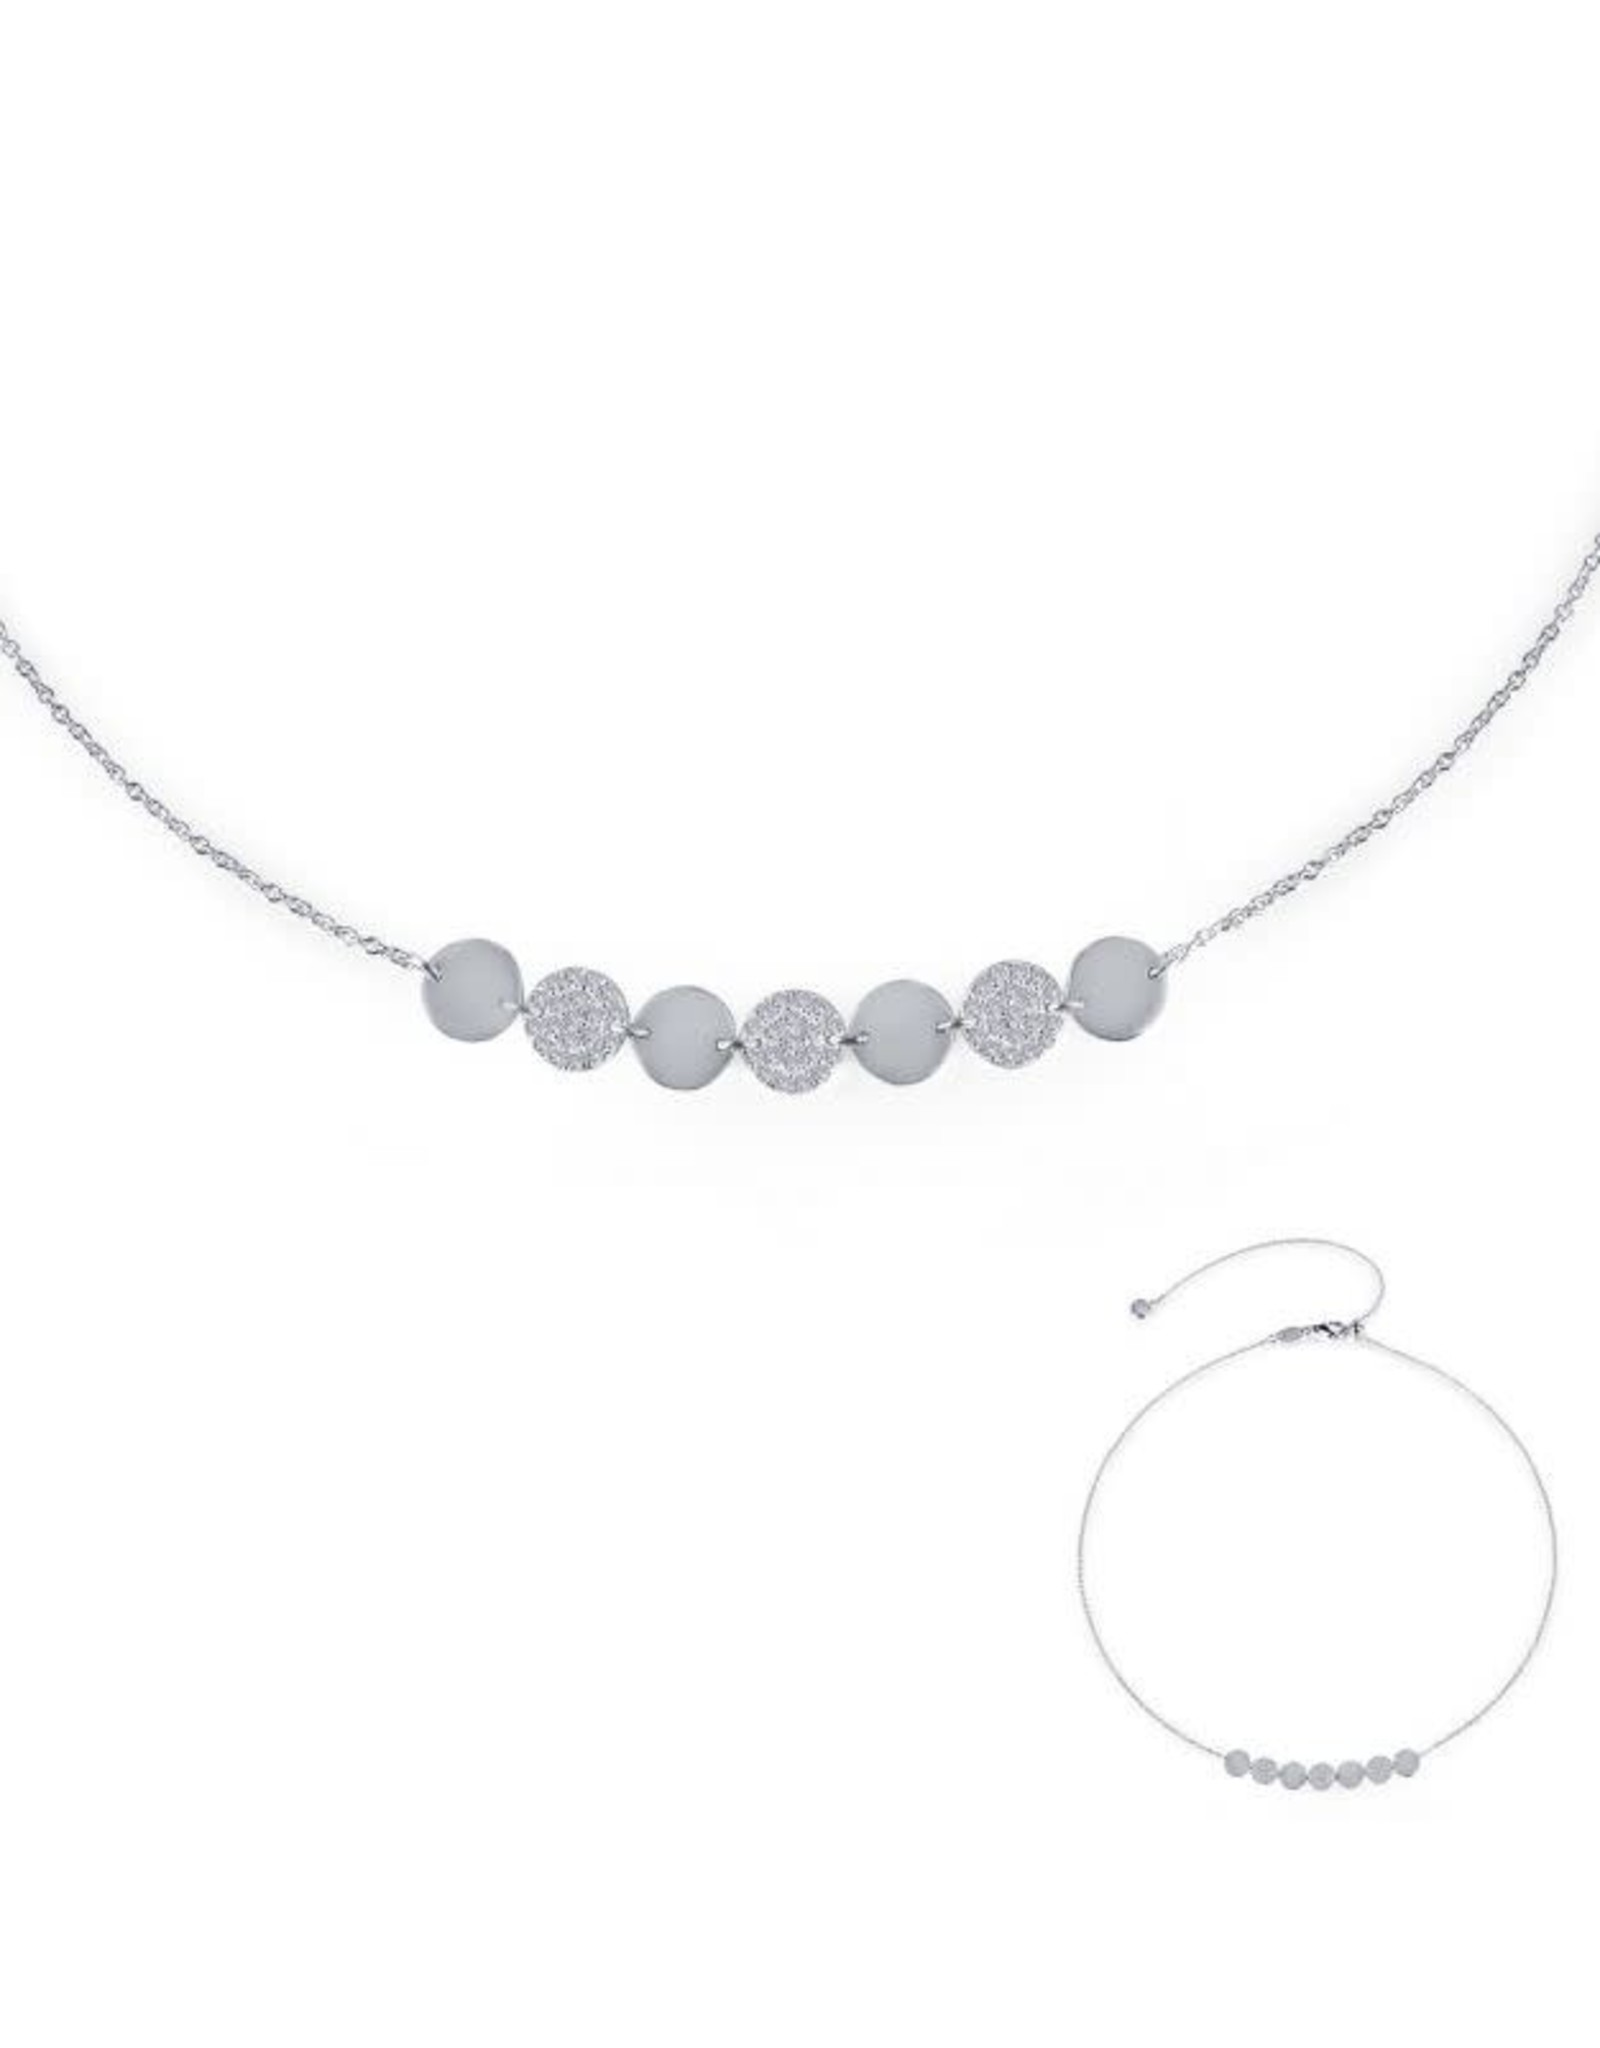 Silver 7 Symbols of Joy Necklace with Pave Zirconias, CZ: 0.82ct